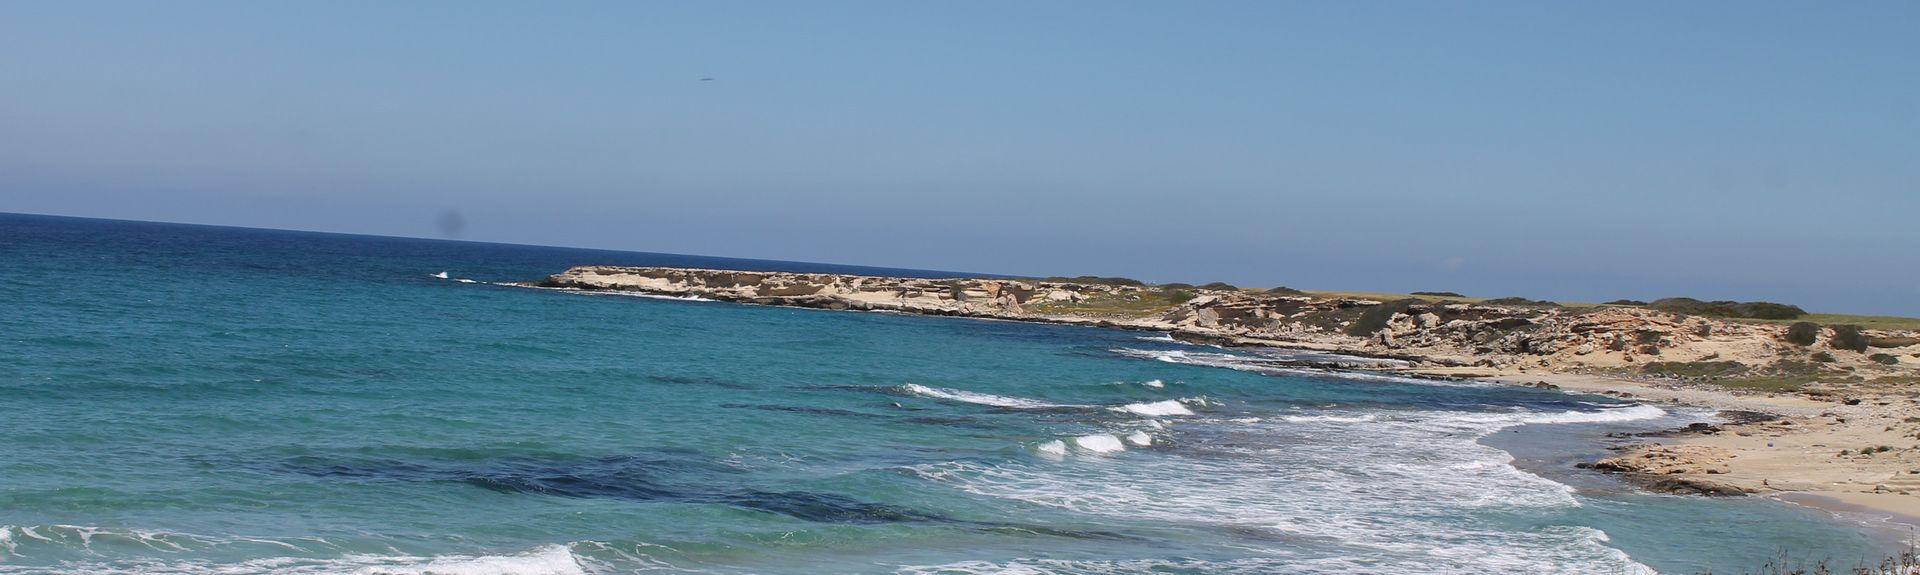 Ozankoy, Kyrenia, Northern Cyprus